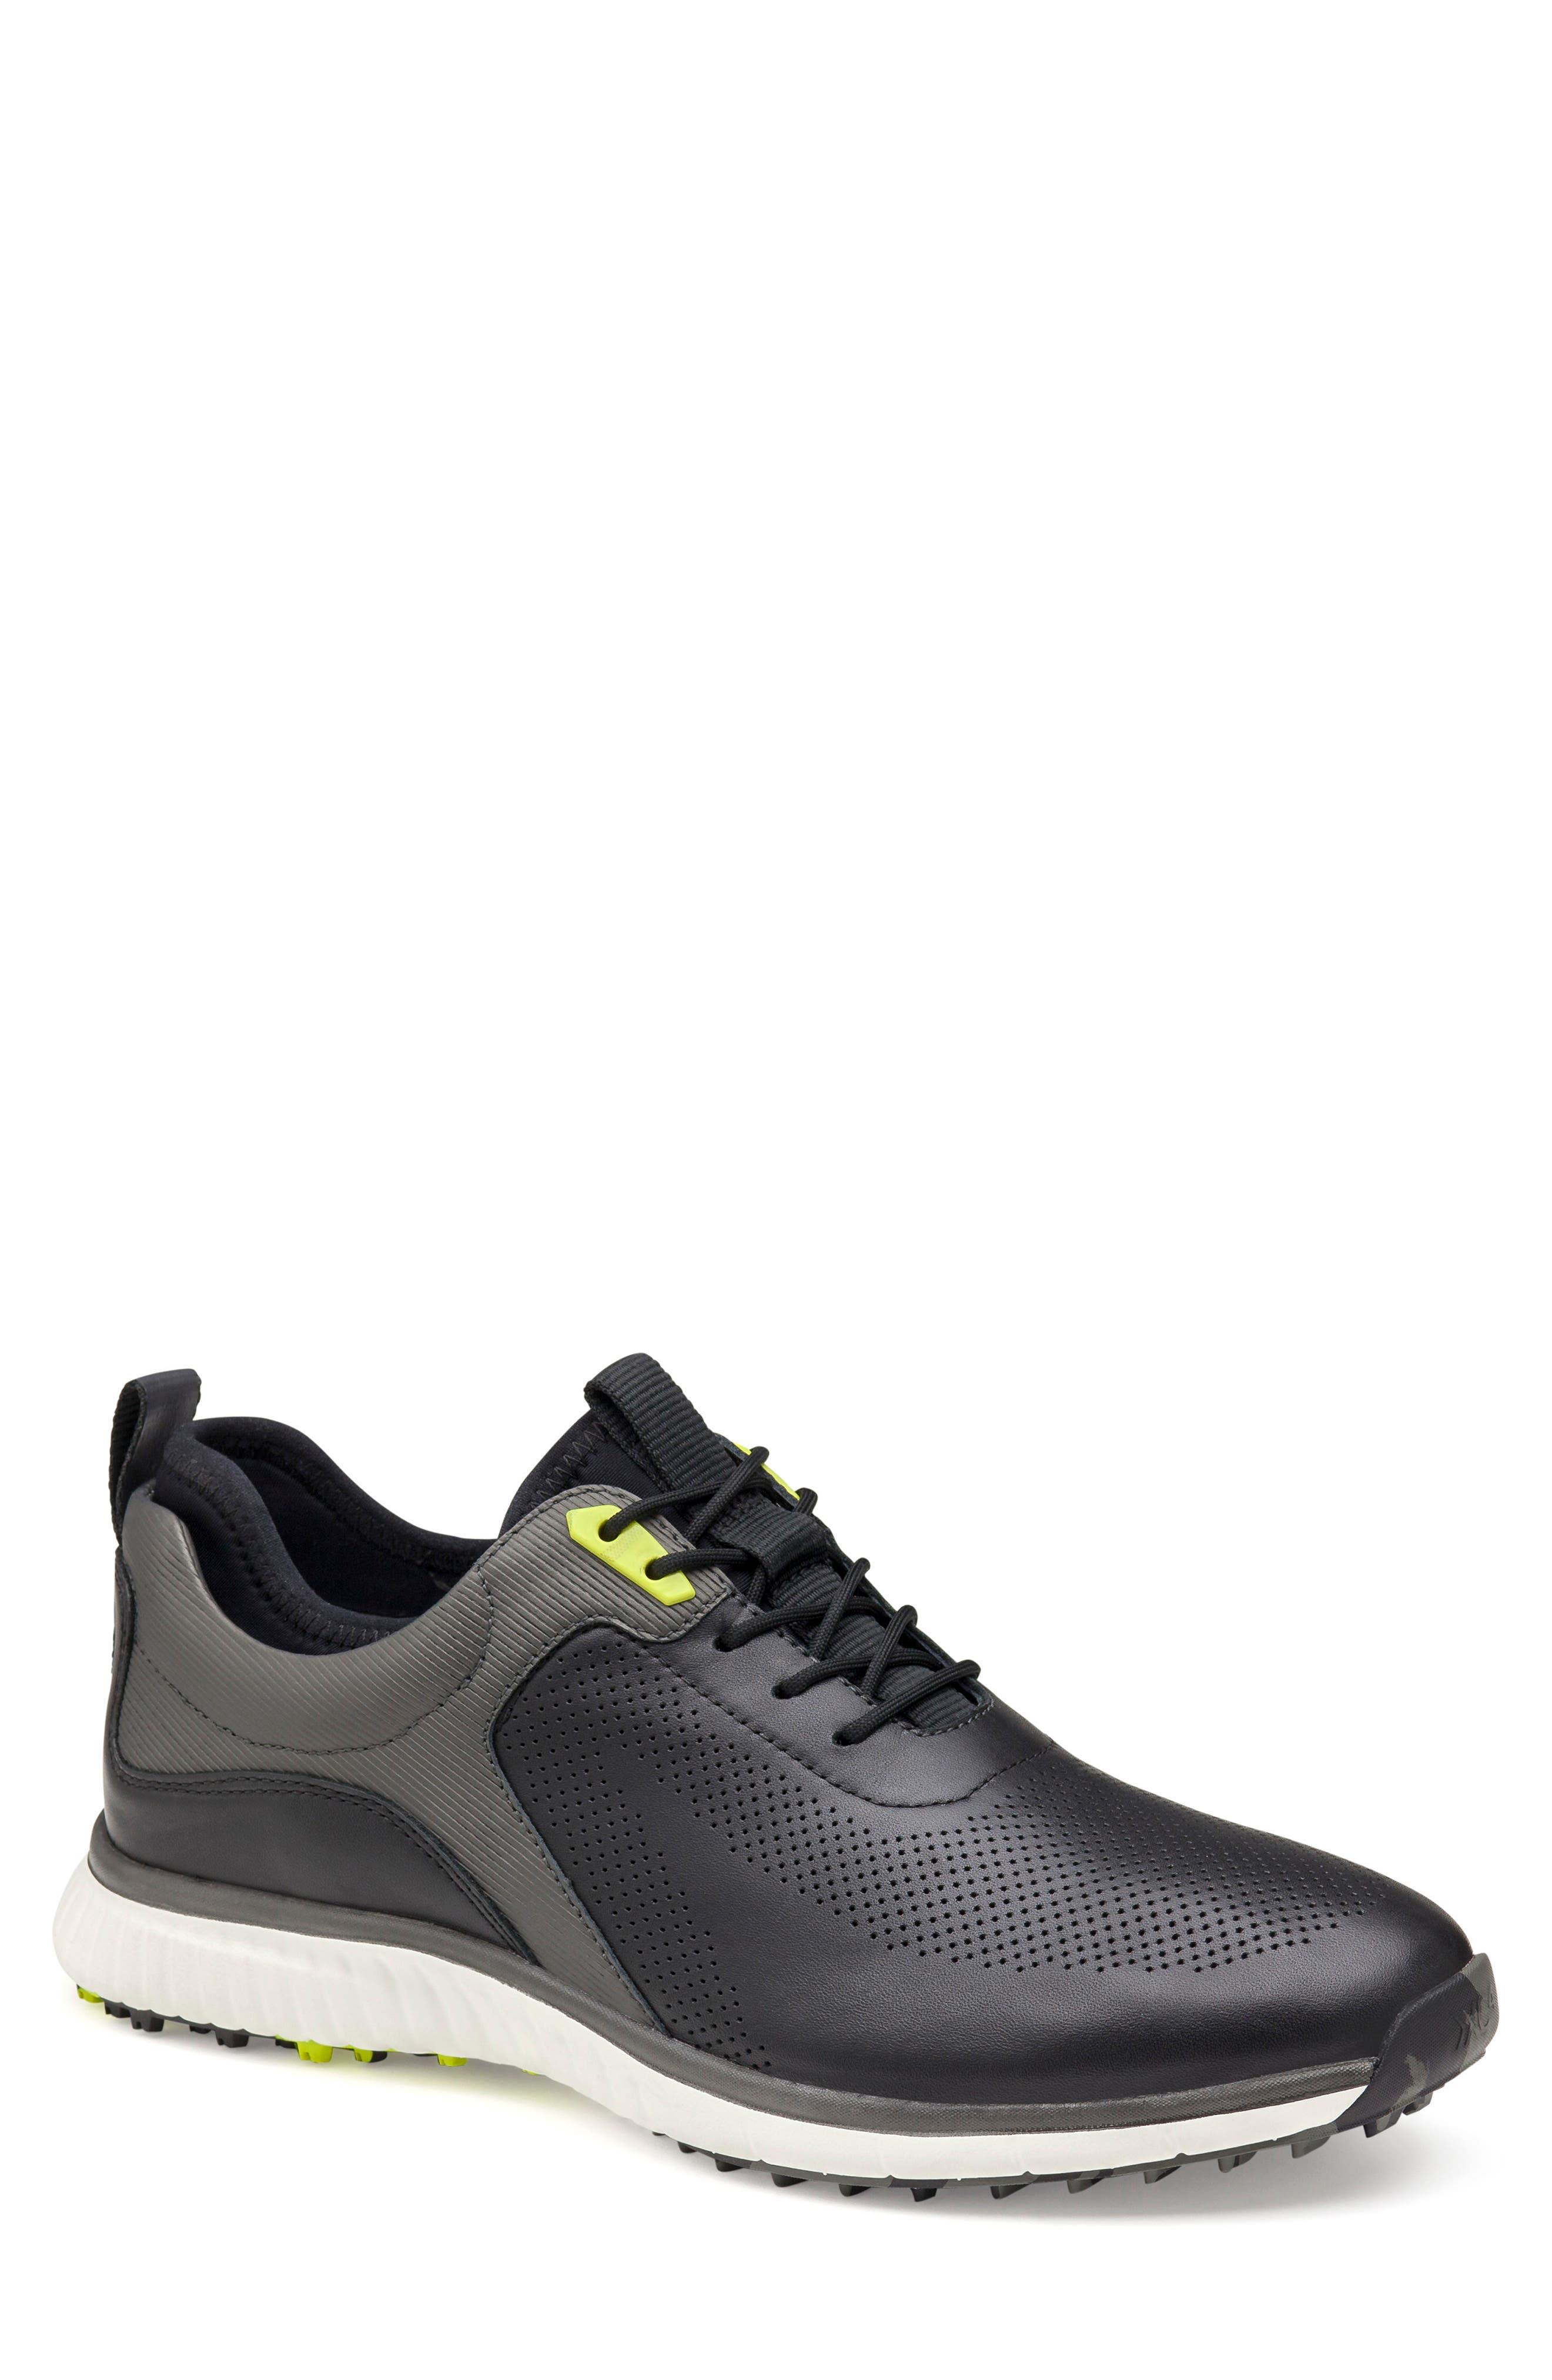 Xc4 H1 Luxe Hybrid Waterproof Golf Sneaker